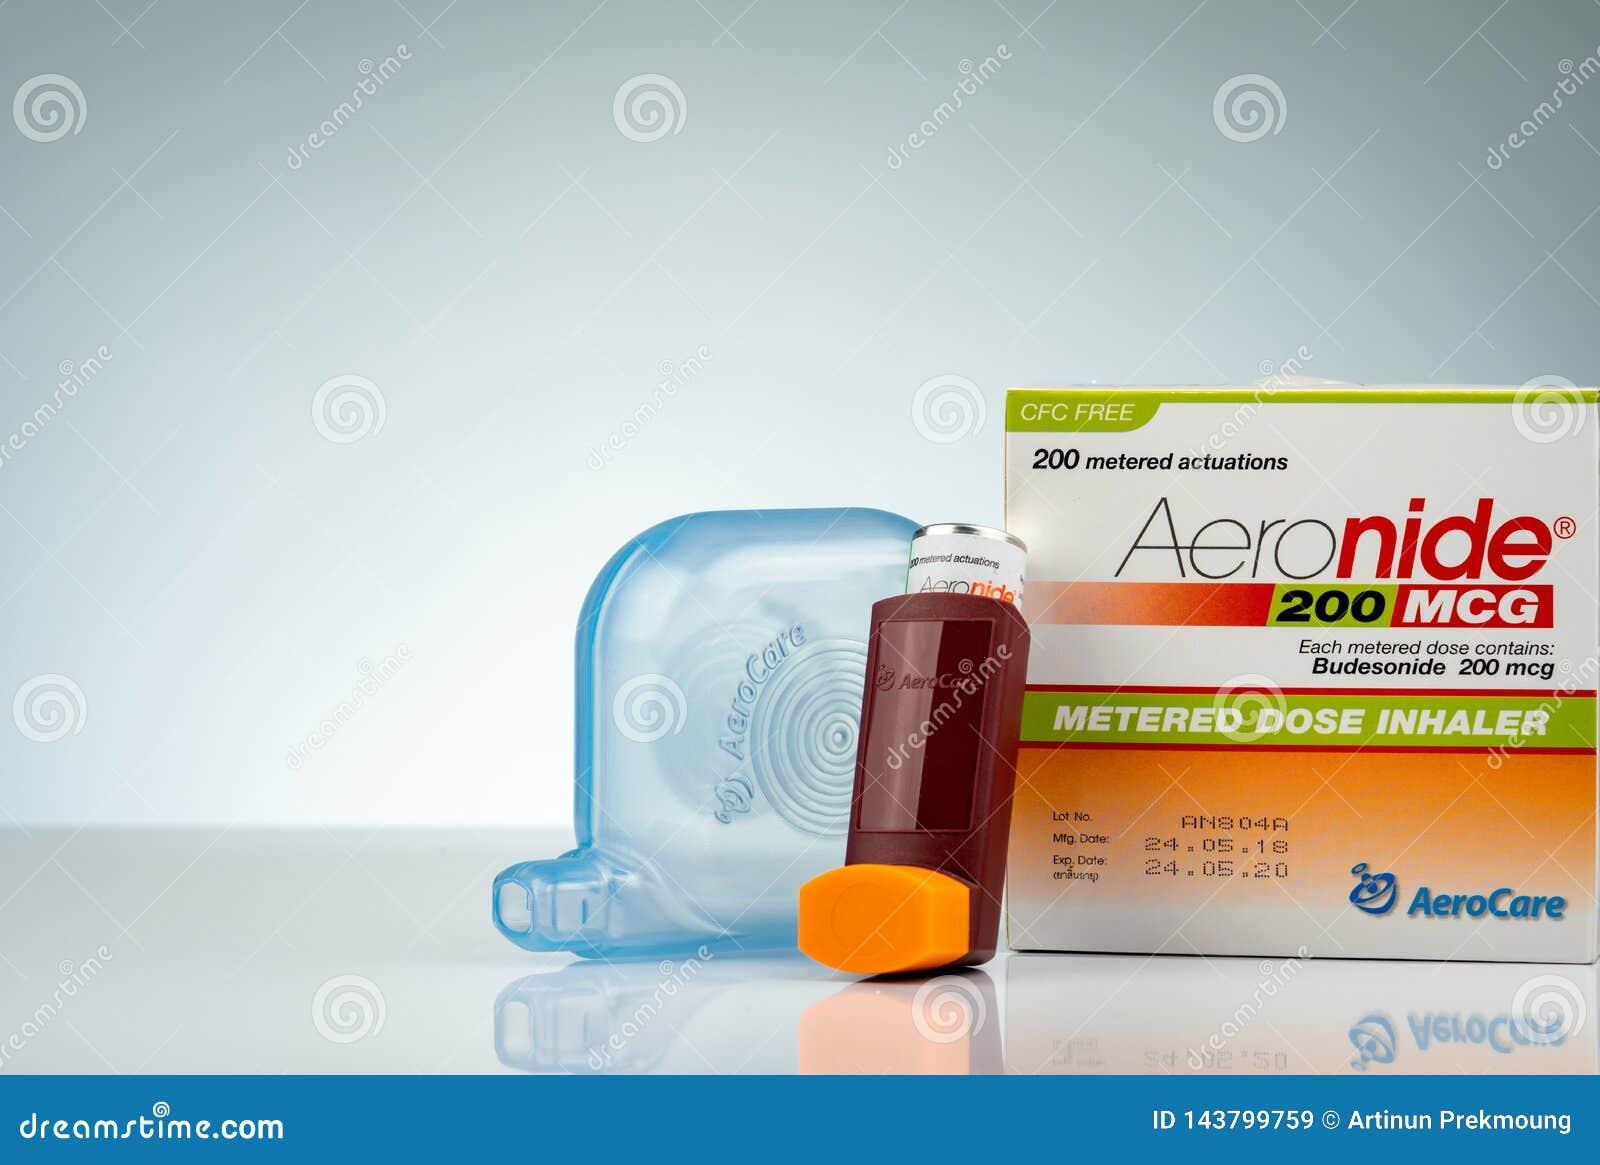 Aeronide inhaler and plastic spacer isolated on gradient background. Asthma inhaler. Steroids inhaler medicine for asthma.